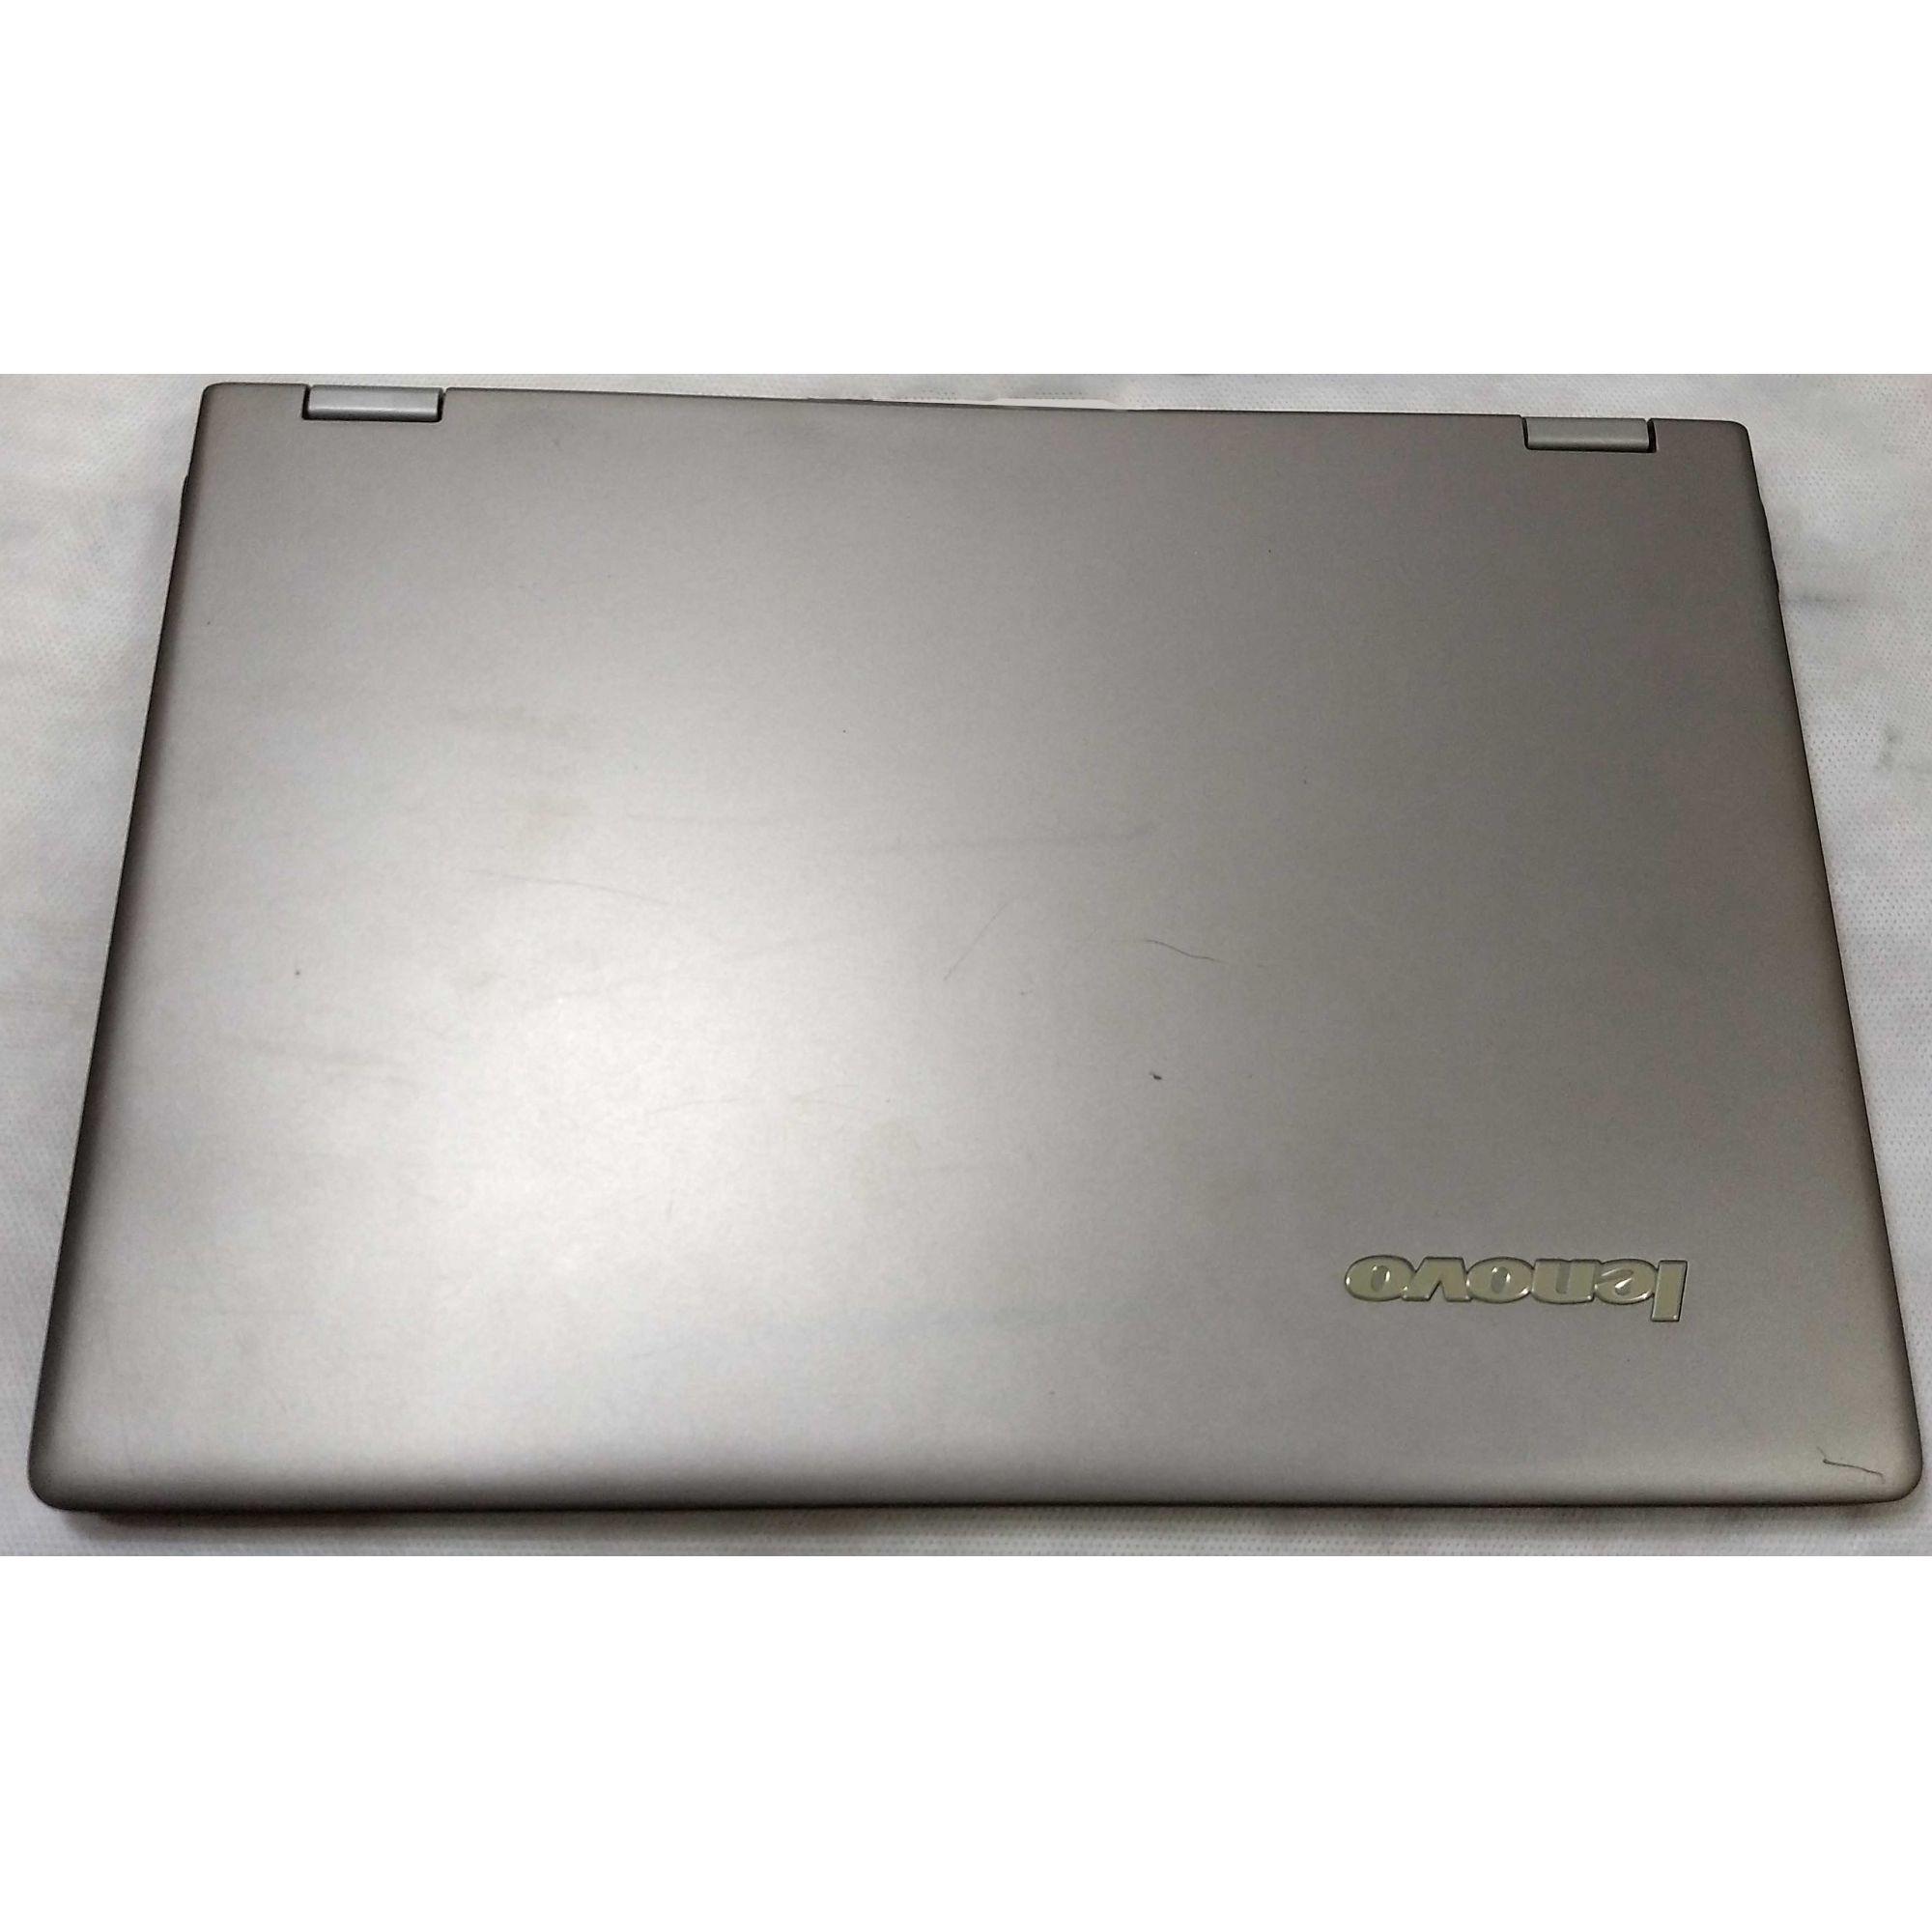 IdeaPad Yoga VENUSTZ 11'' Nvidia Tegra 3 Quad Core 1.3 2GB HD-30GB TOUCH